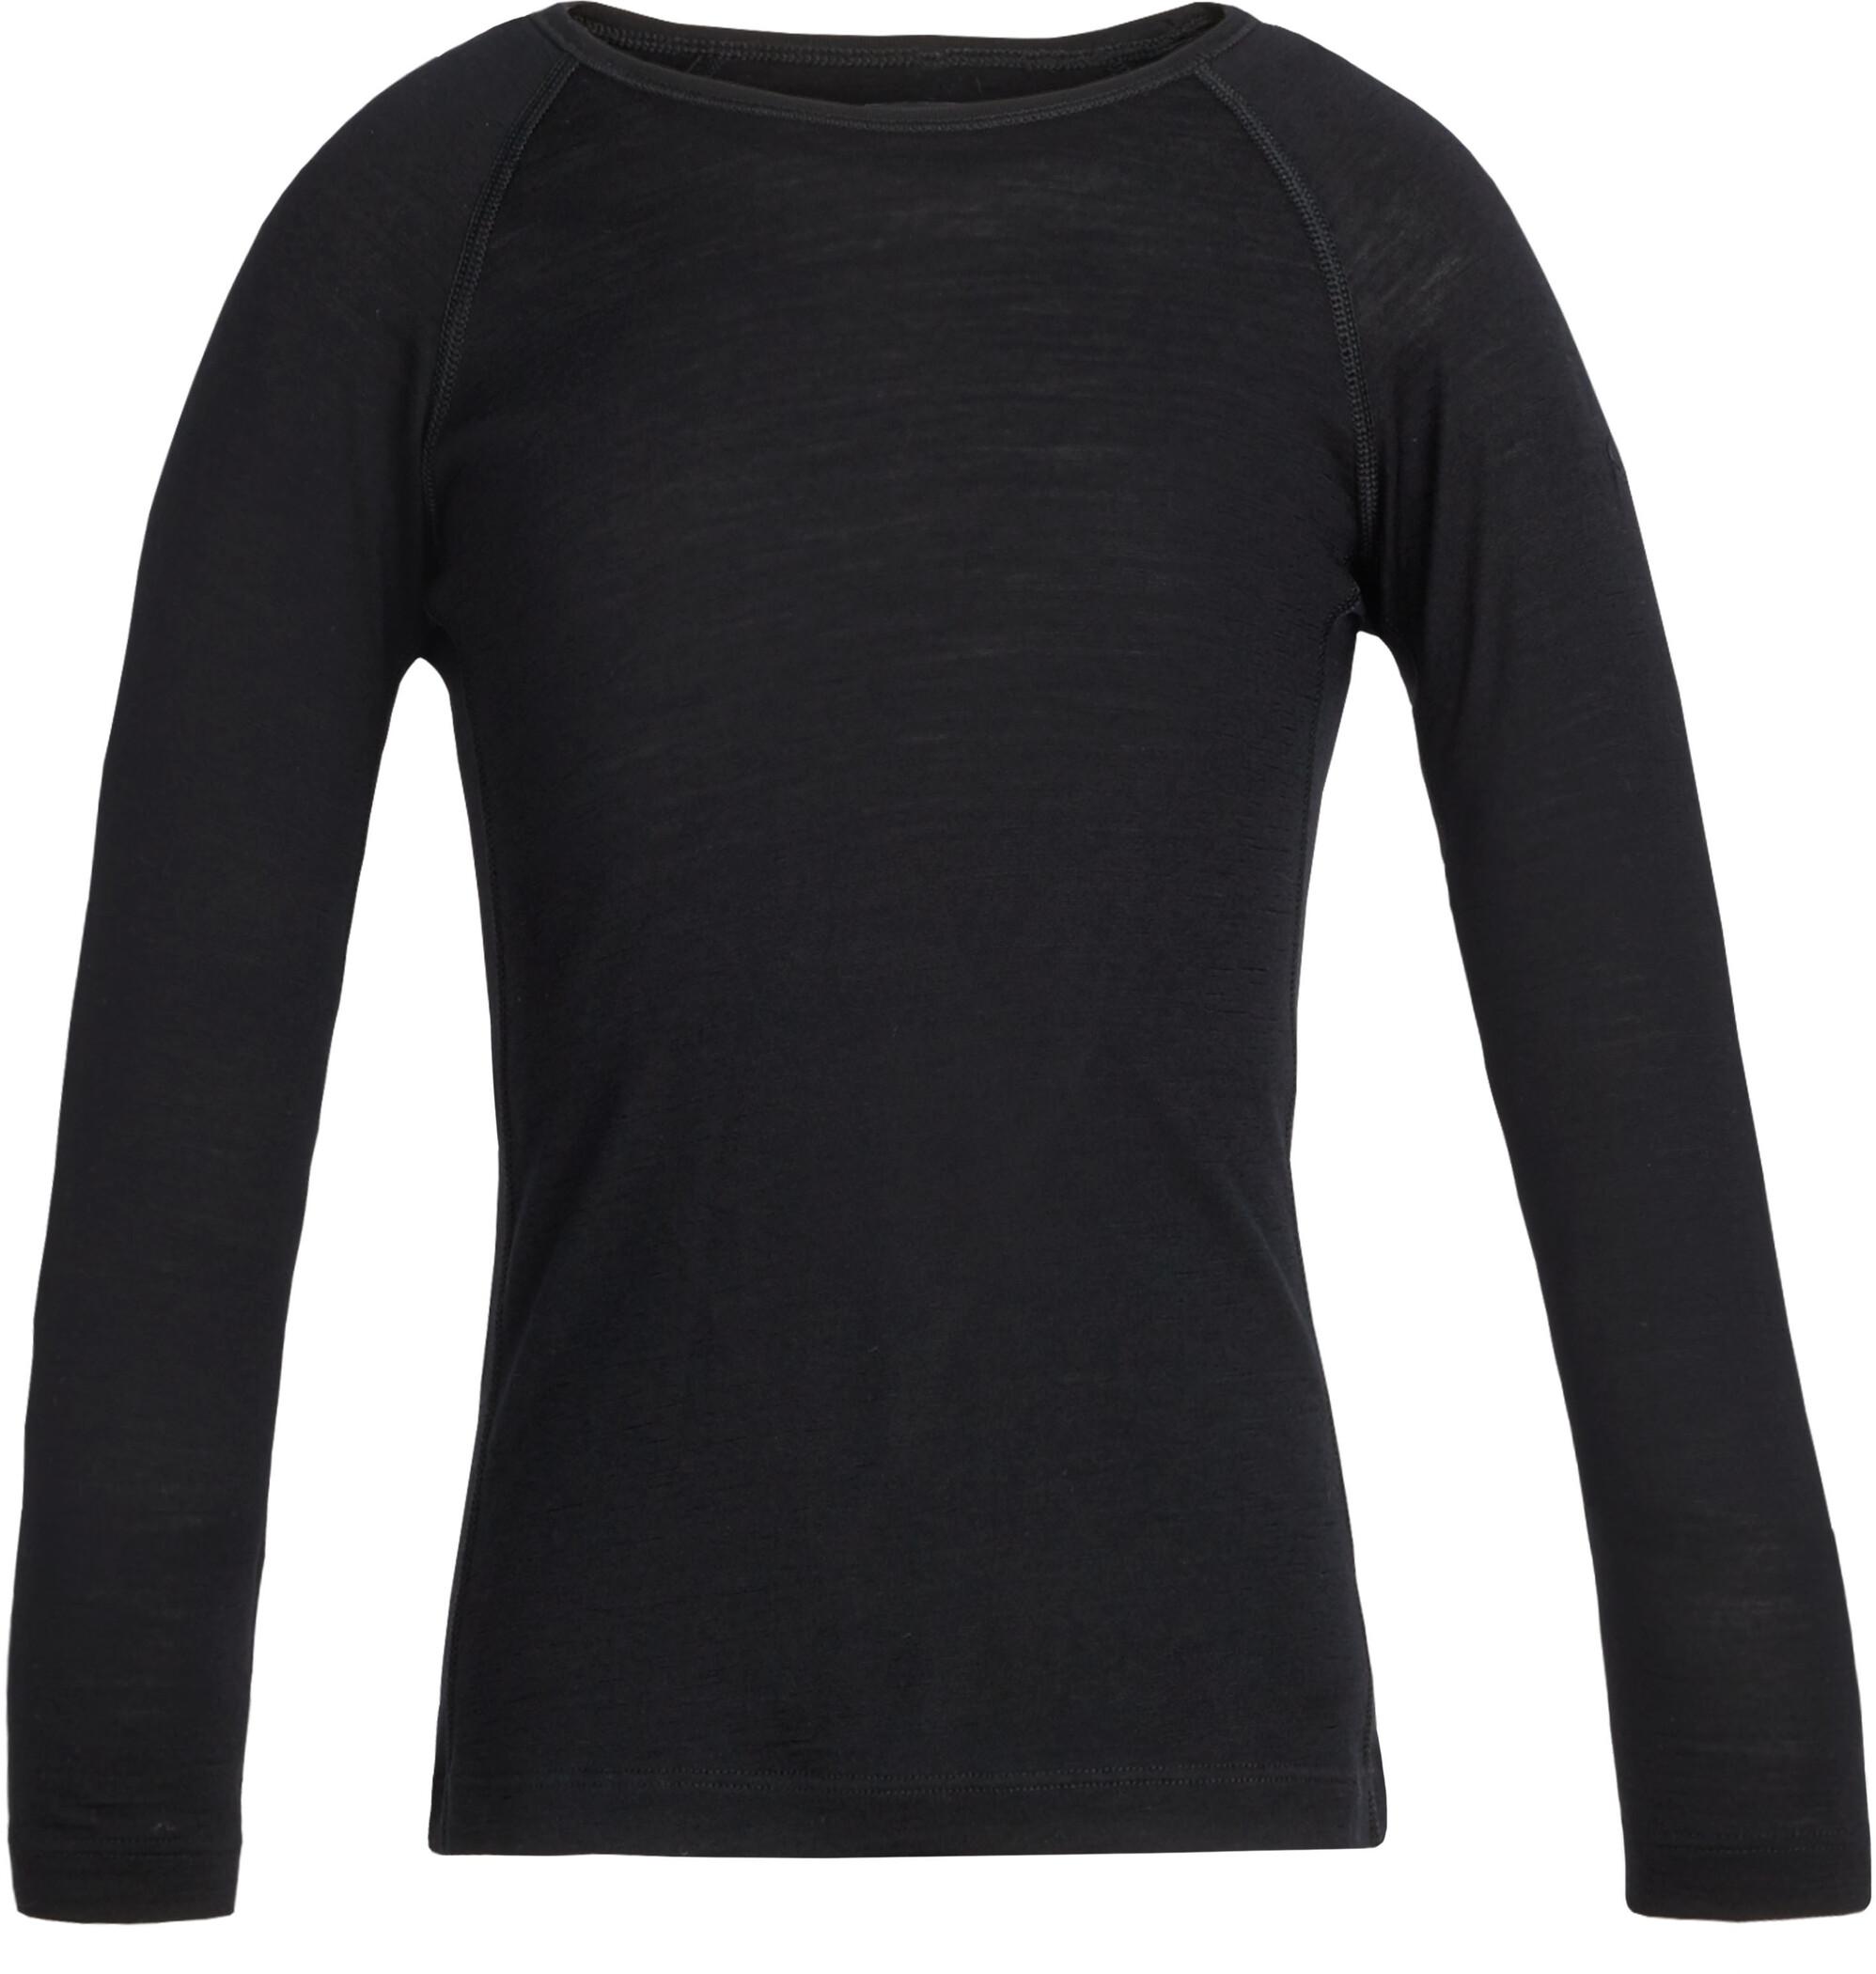 Icebreaker 200 Oasis Langærmet T-shirt Børn, black (2019) | Base layers